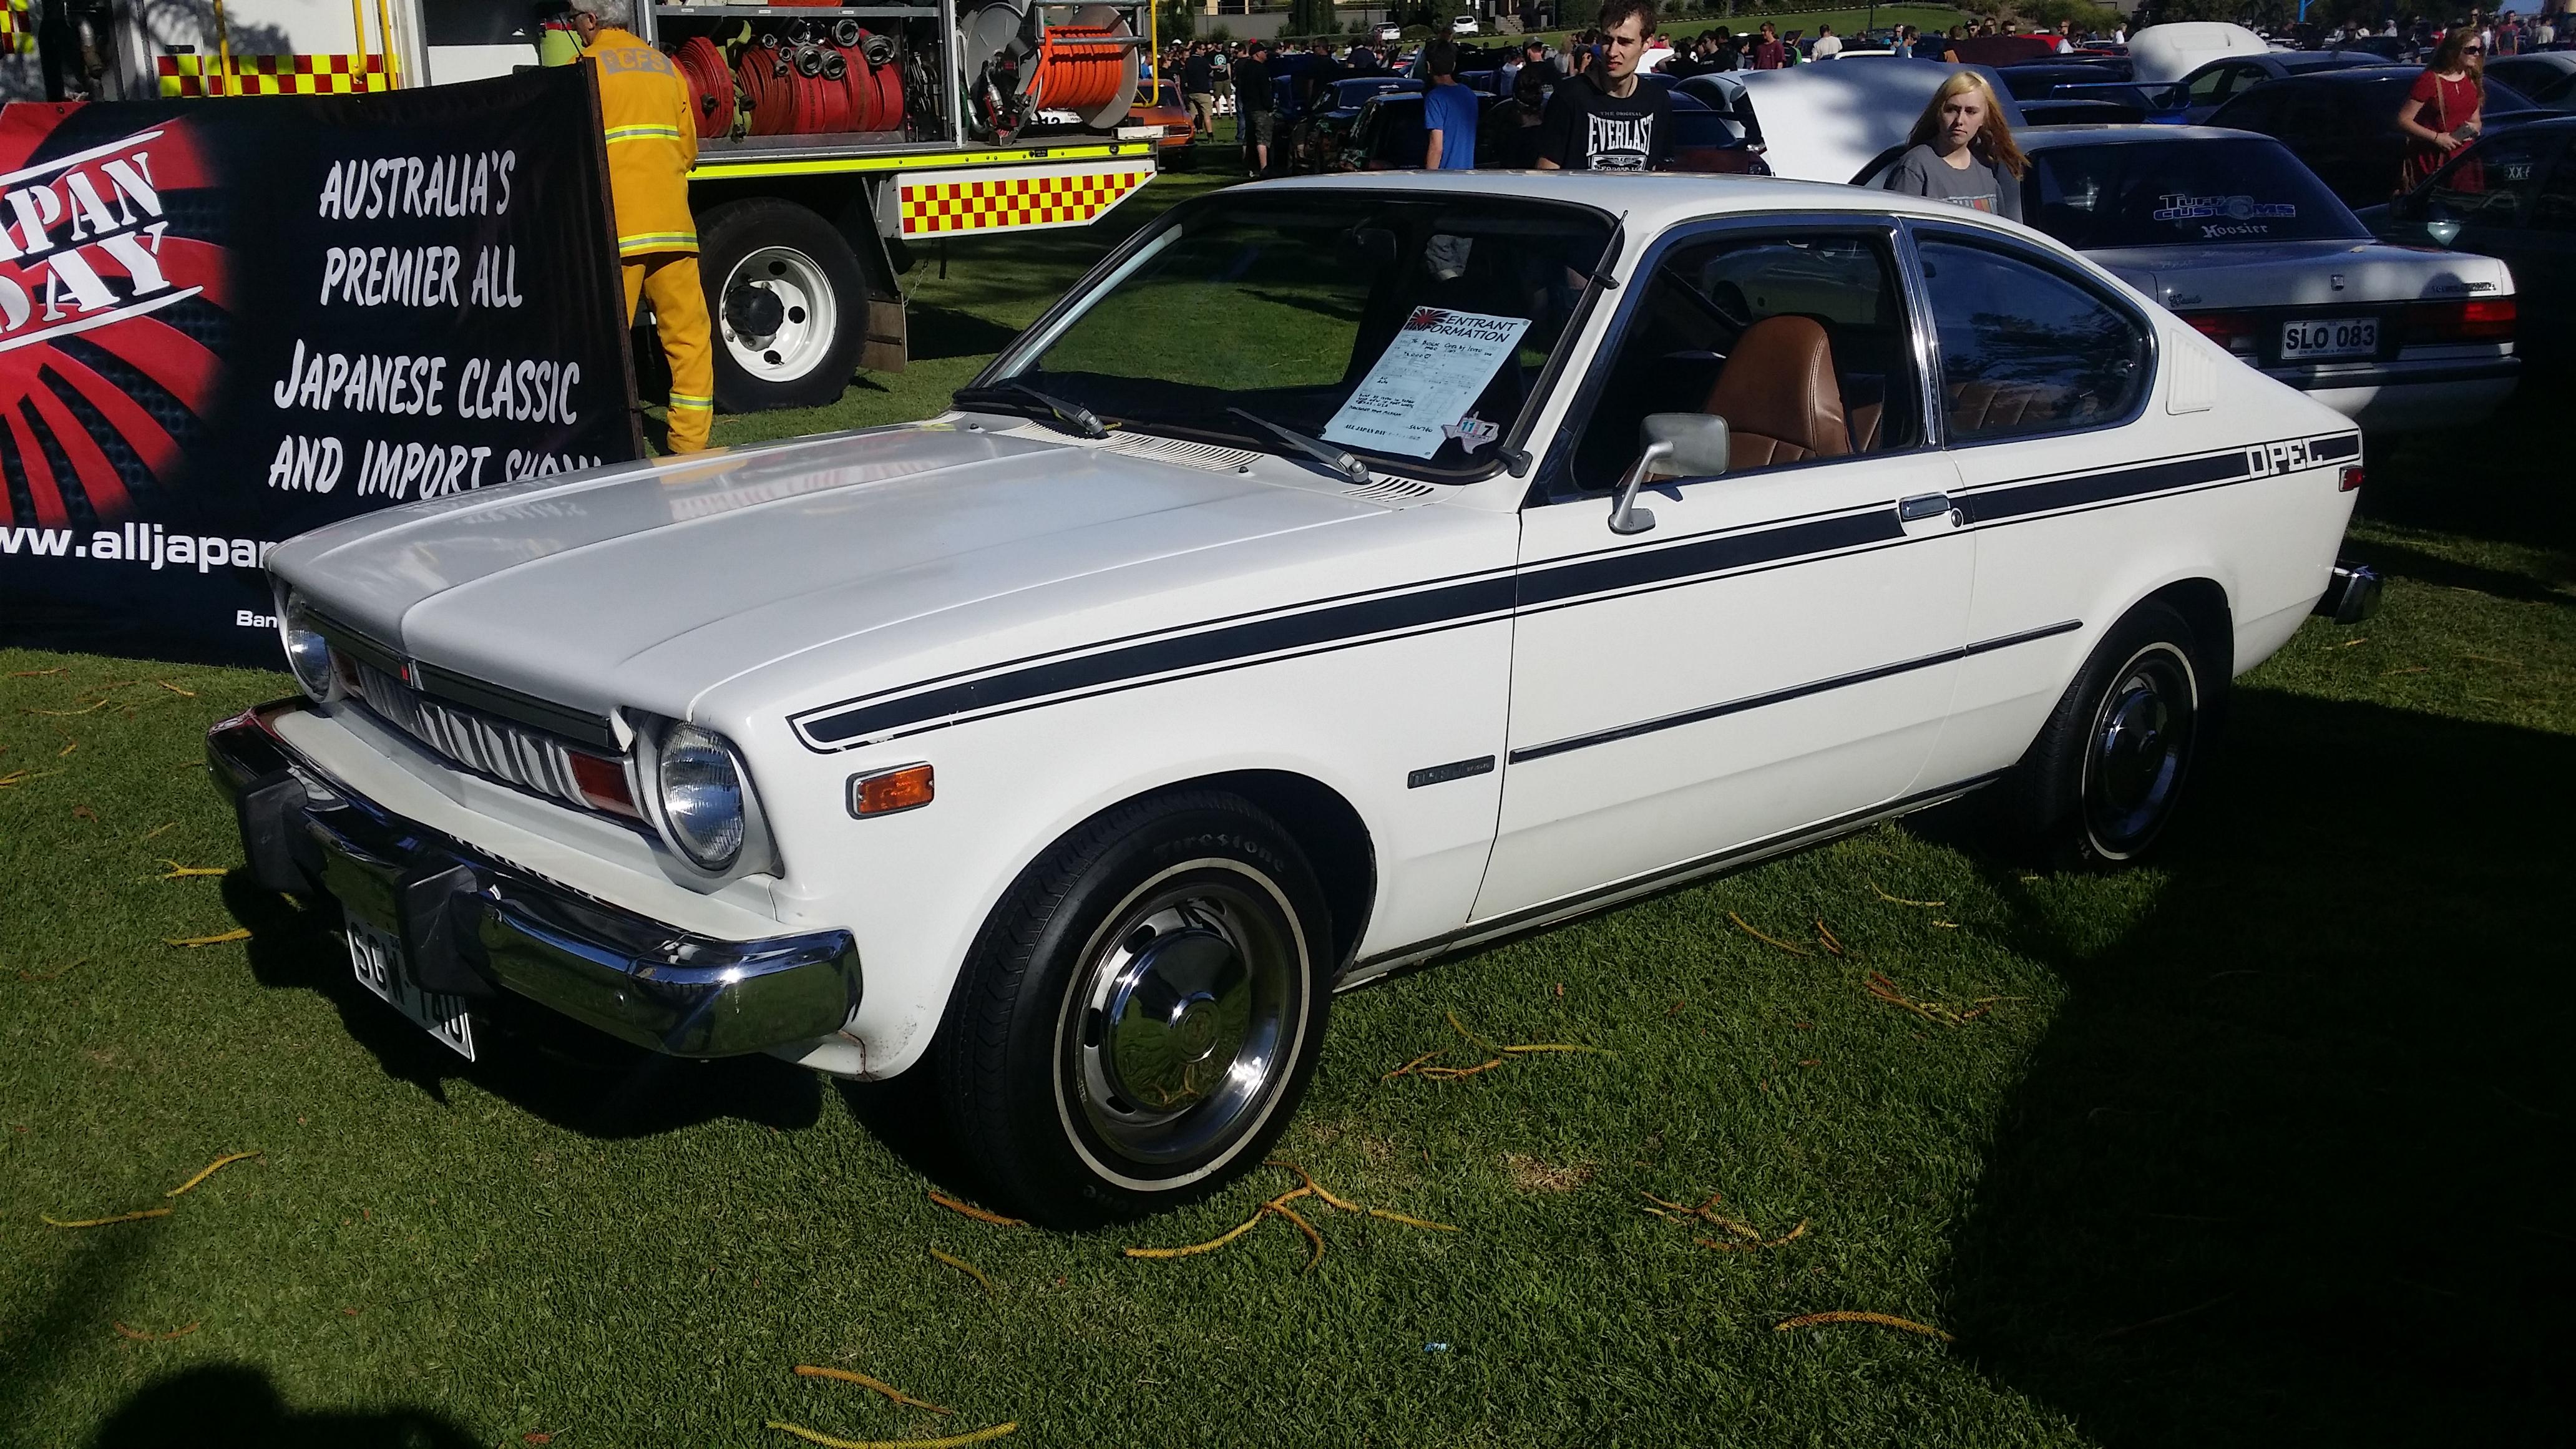 Buick T Type >> File:1976 Buick Opel - 90,000km (16816206825).jpg - Wikimedia Commons